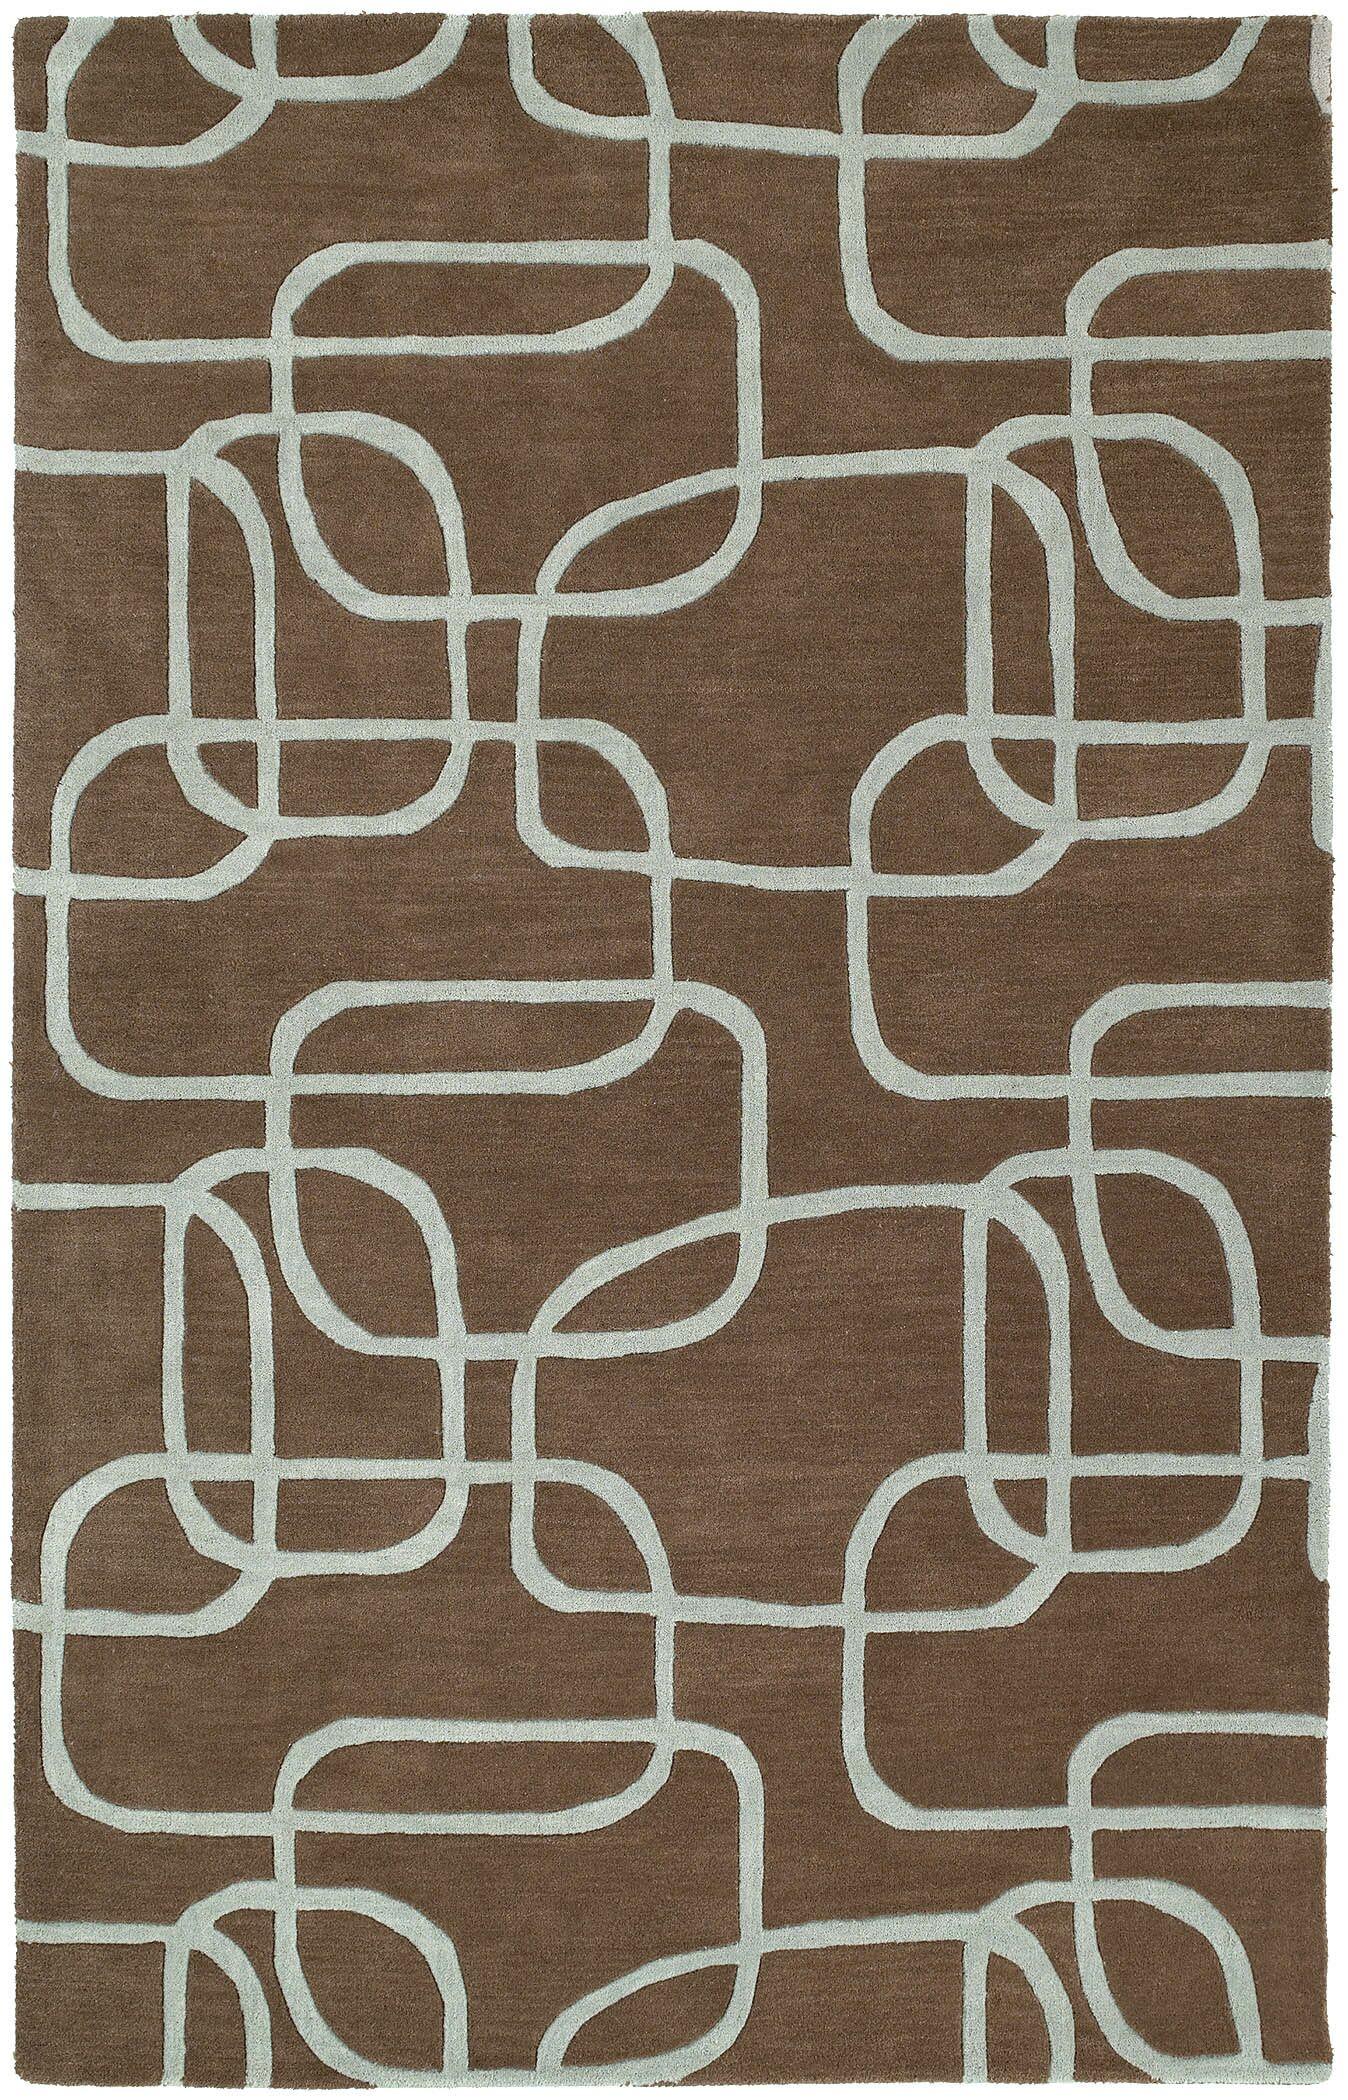 Carter Brown Area Rug Rug Size: Rectangle 8' x 11'